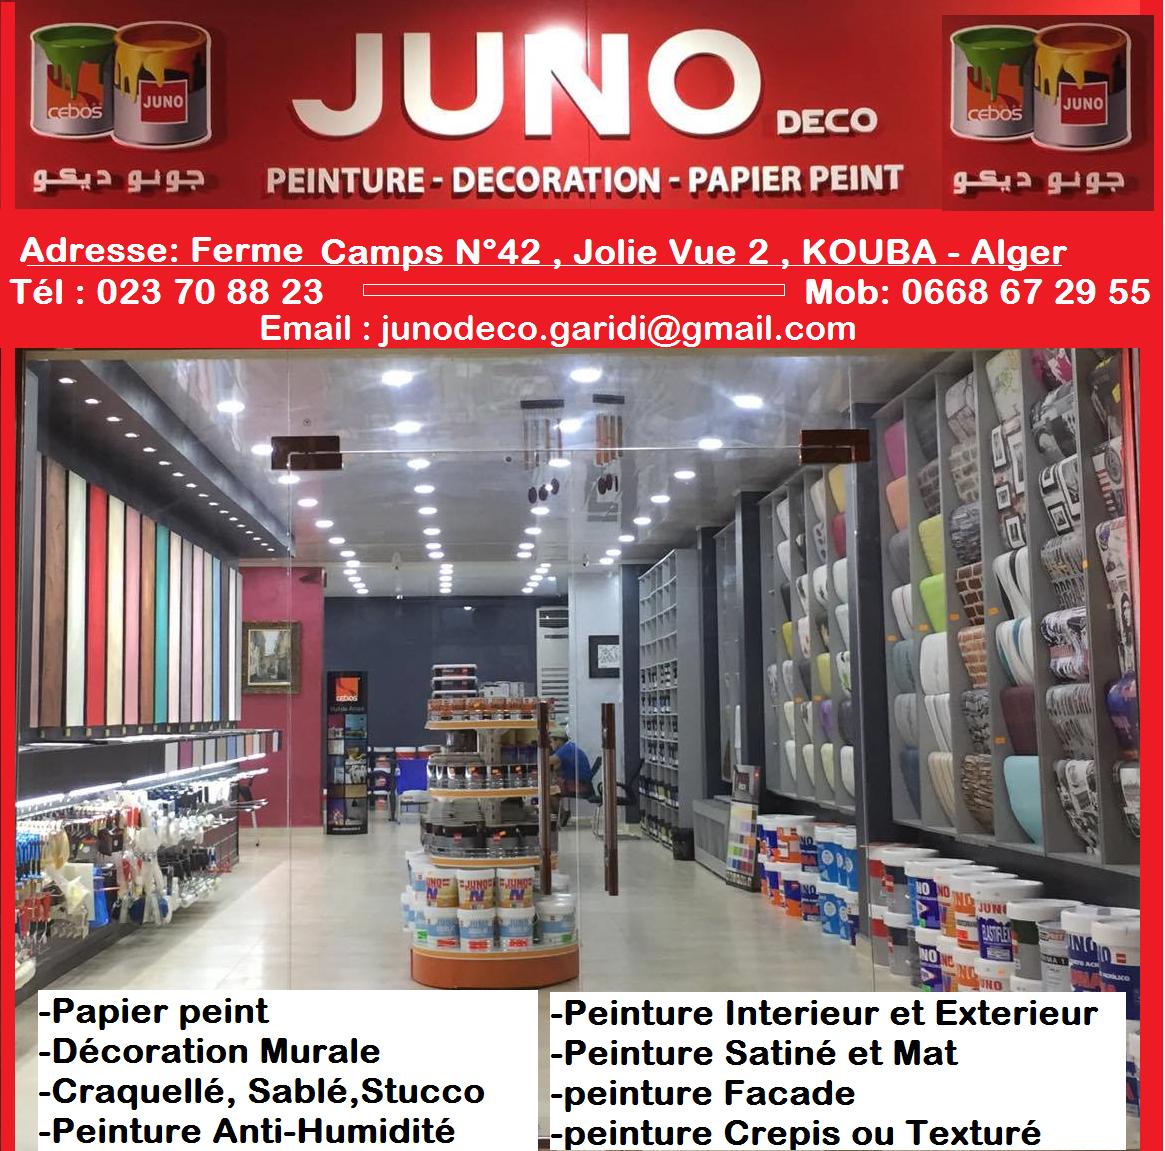 JUNO DECO GARIDI à Alger Jolie Vue 2 , Kouba - Peinture et ...